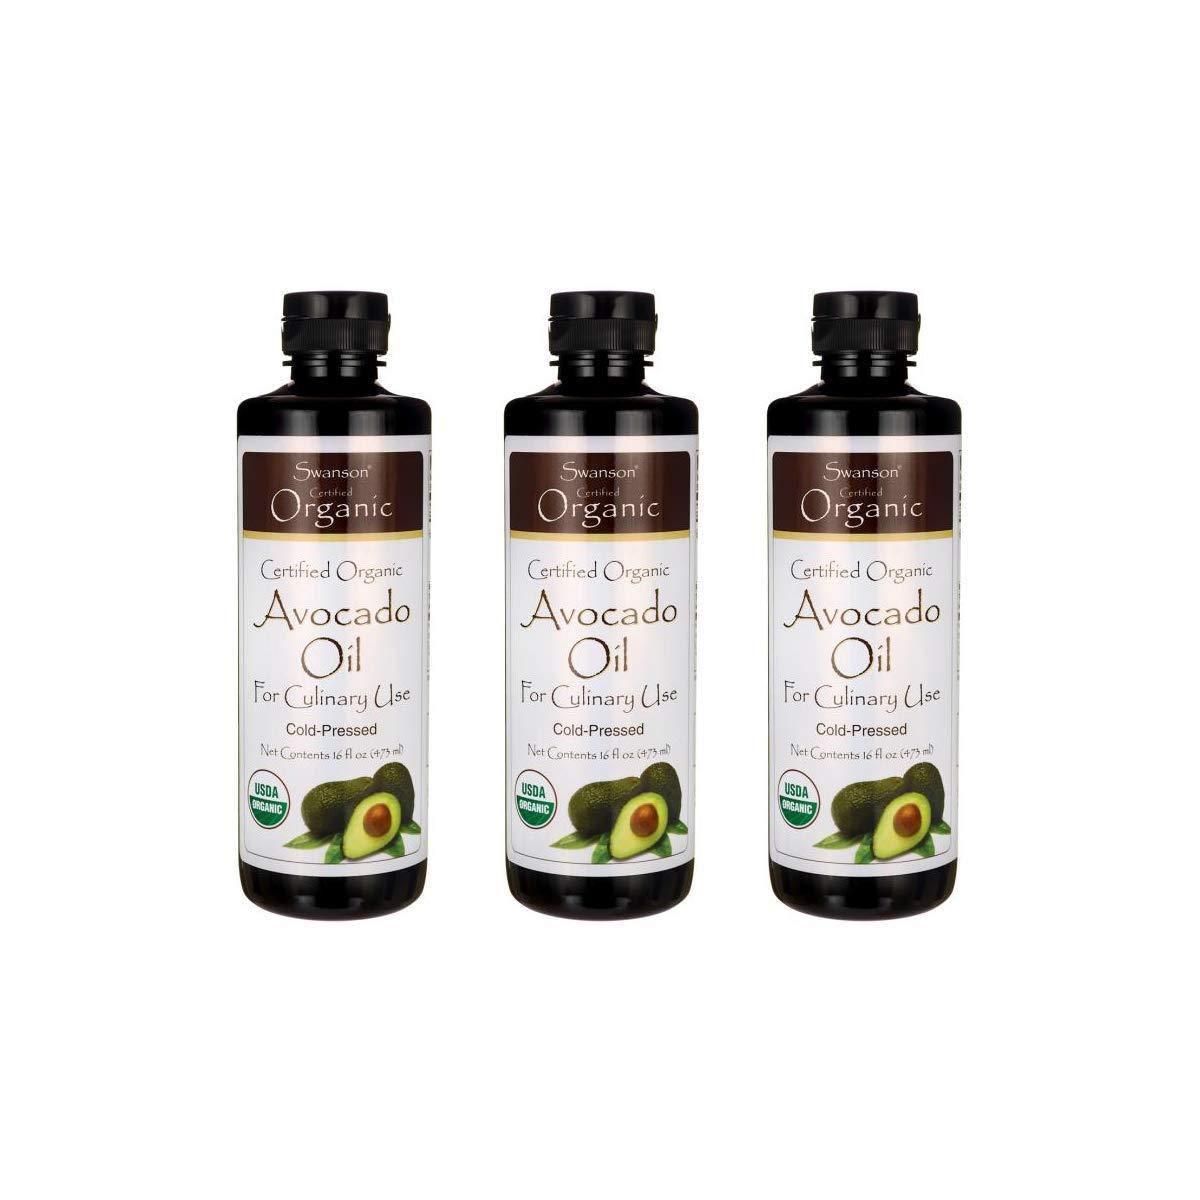 Swanson Certified Organic Avocado Oil 16 fl oz Liquid 3 Pack